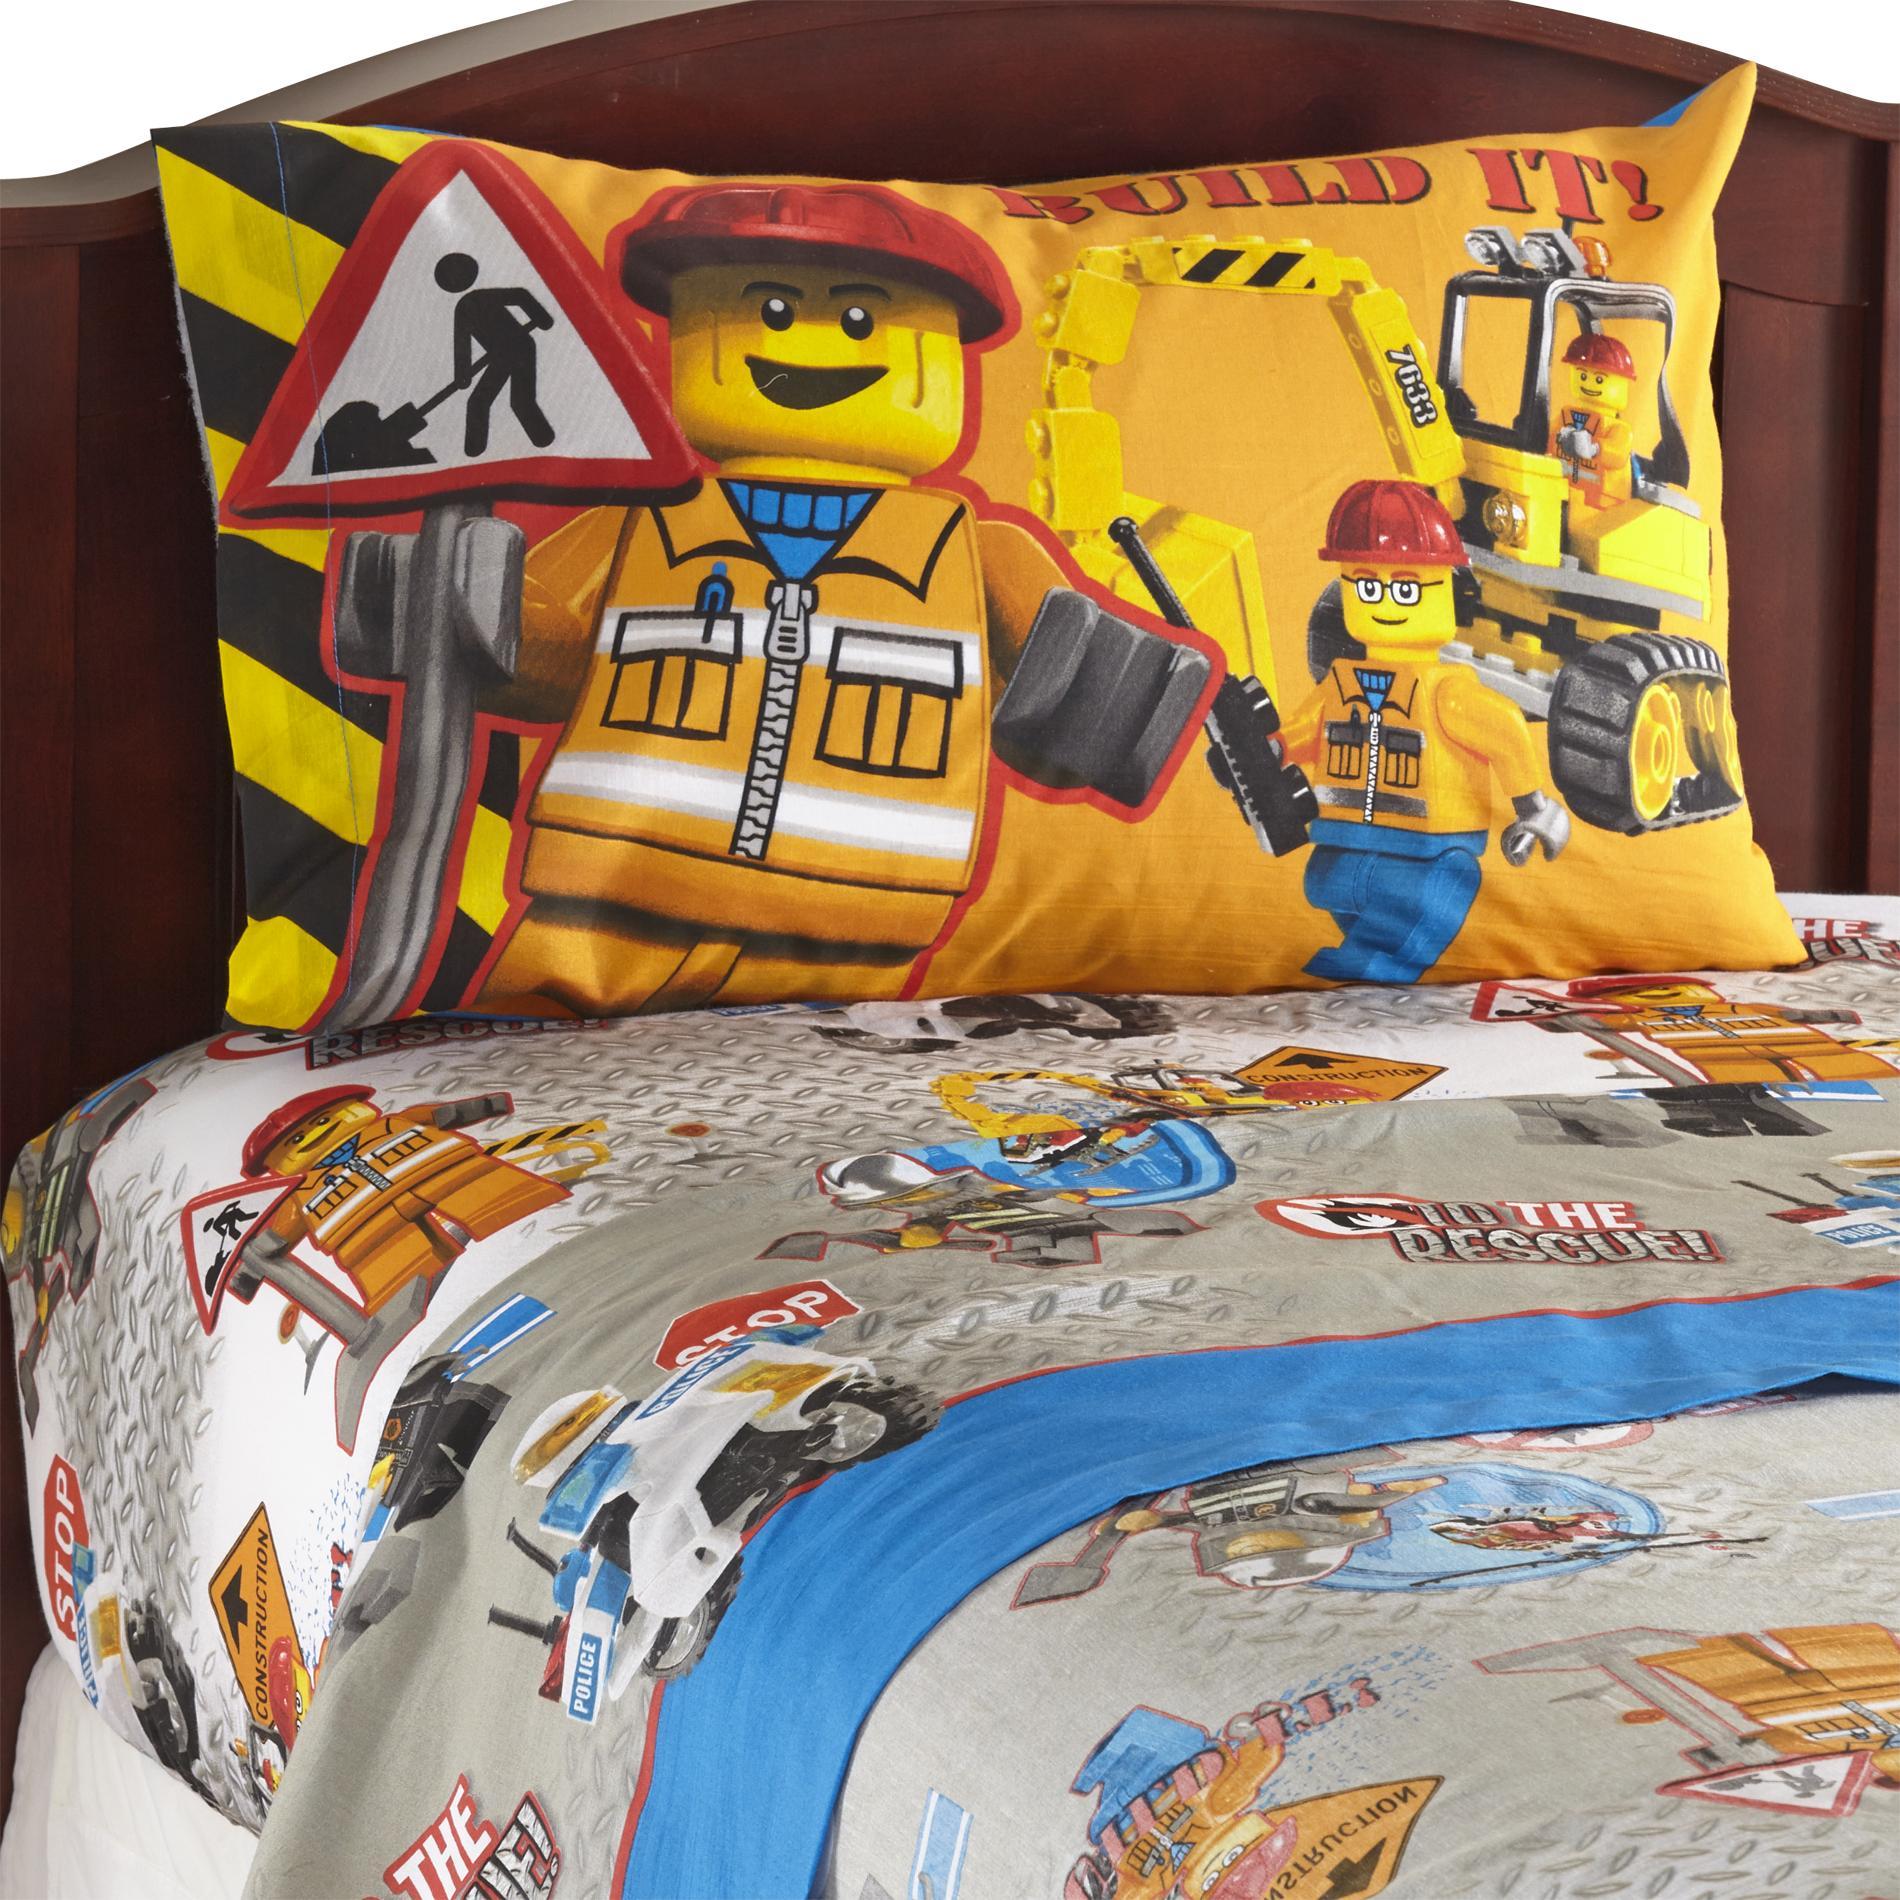 LEGO Boys Sheet Set  Home  Bed  Bath  Bedding  Sheets